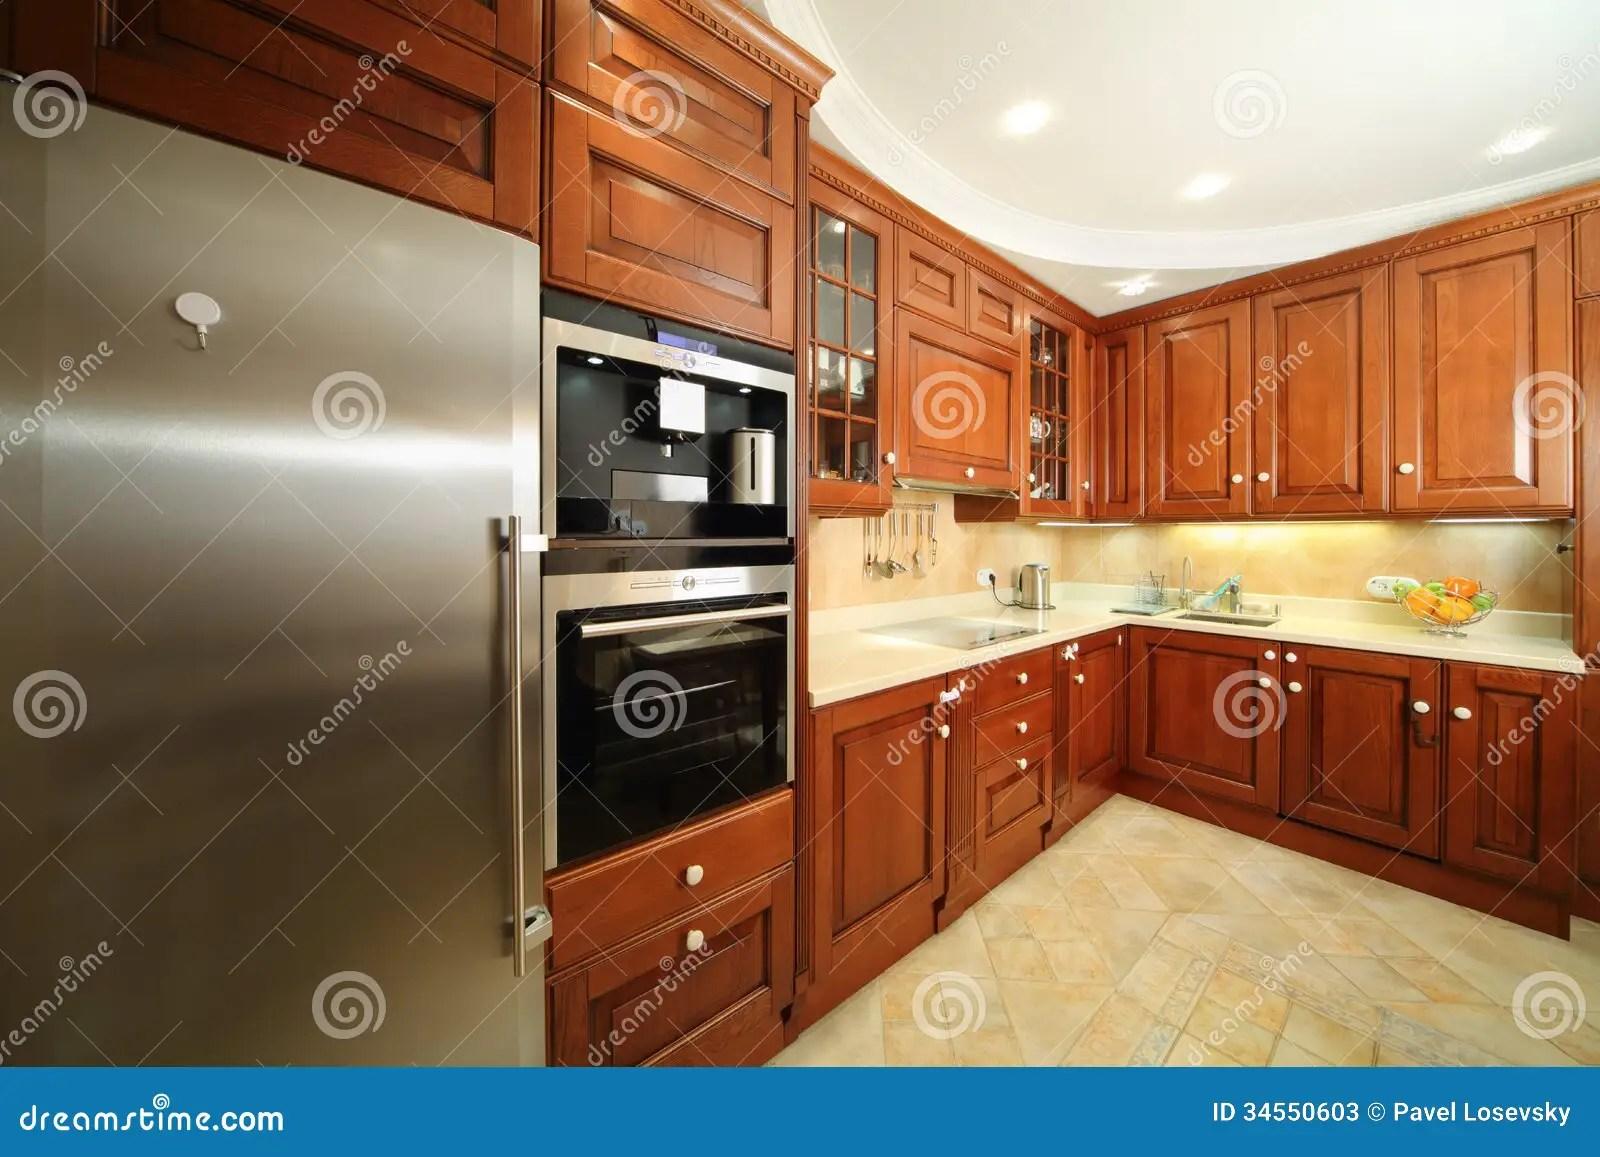 stock photos light clean kitchen wooden furniture integrated oven fridge image kitchen wooden chairs Light clean kitchen with wooden furniture